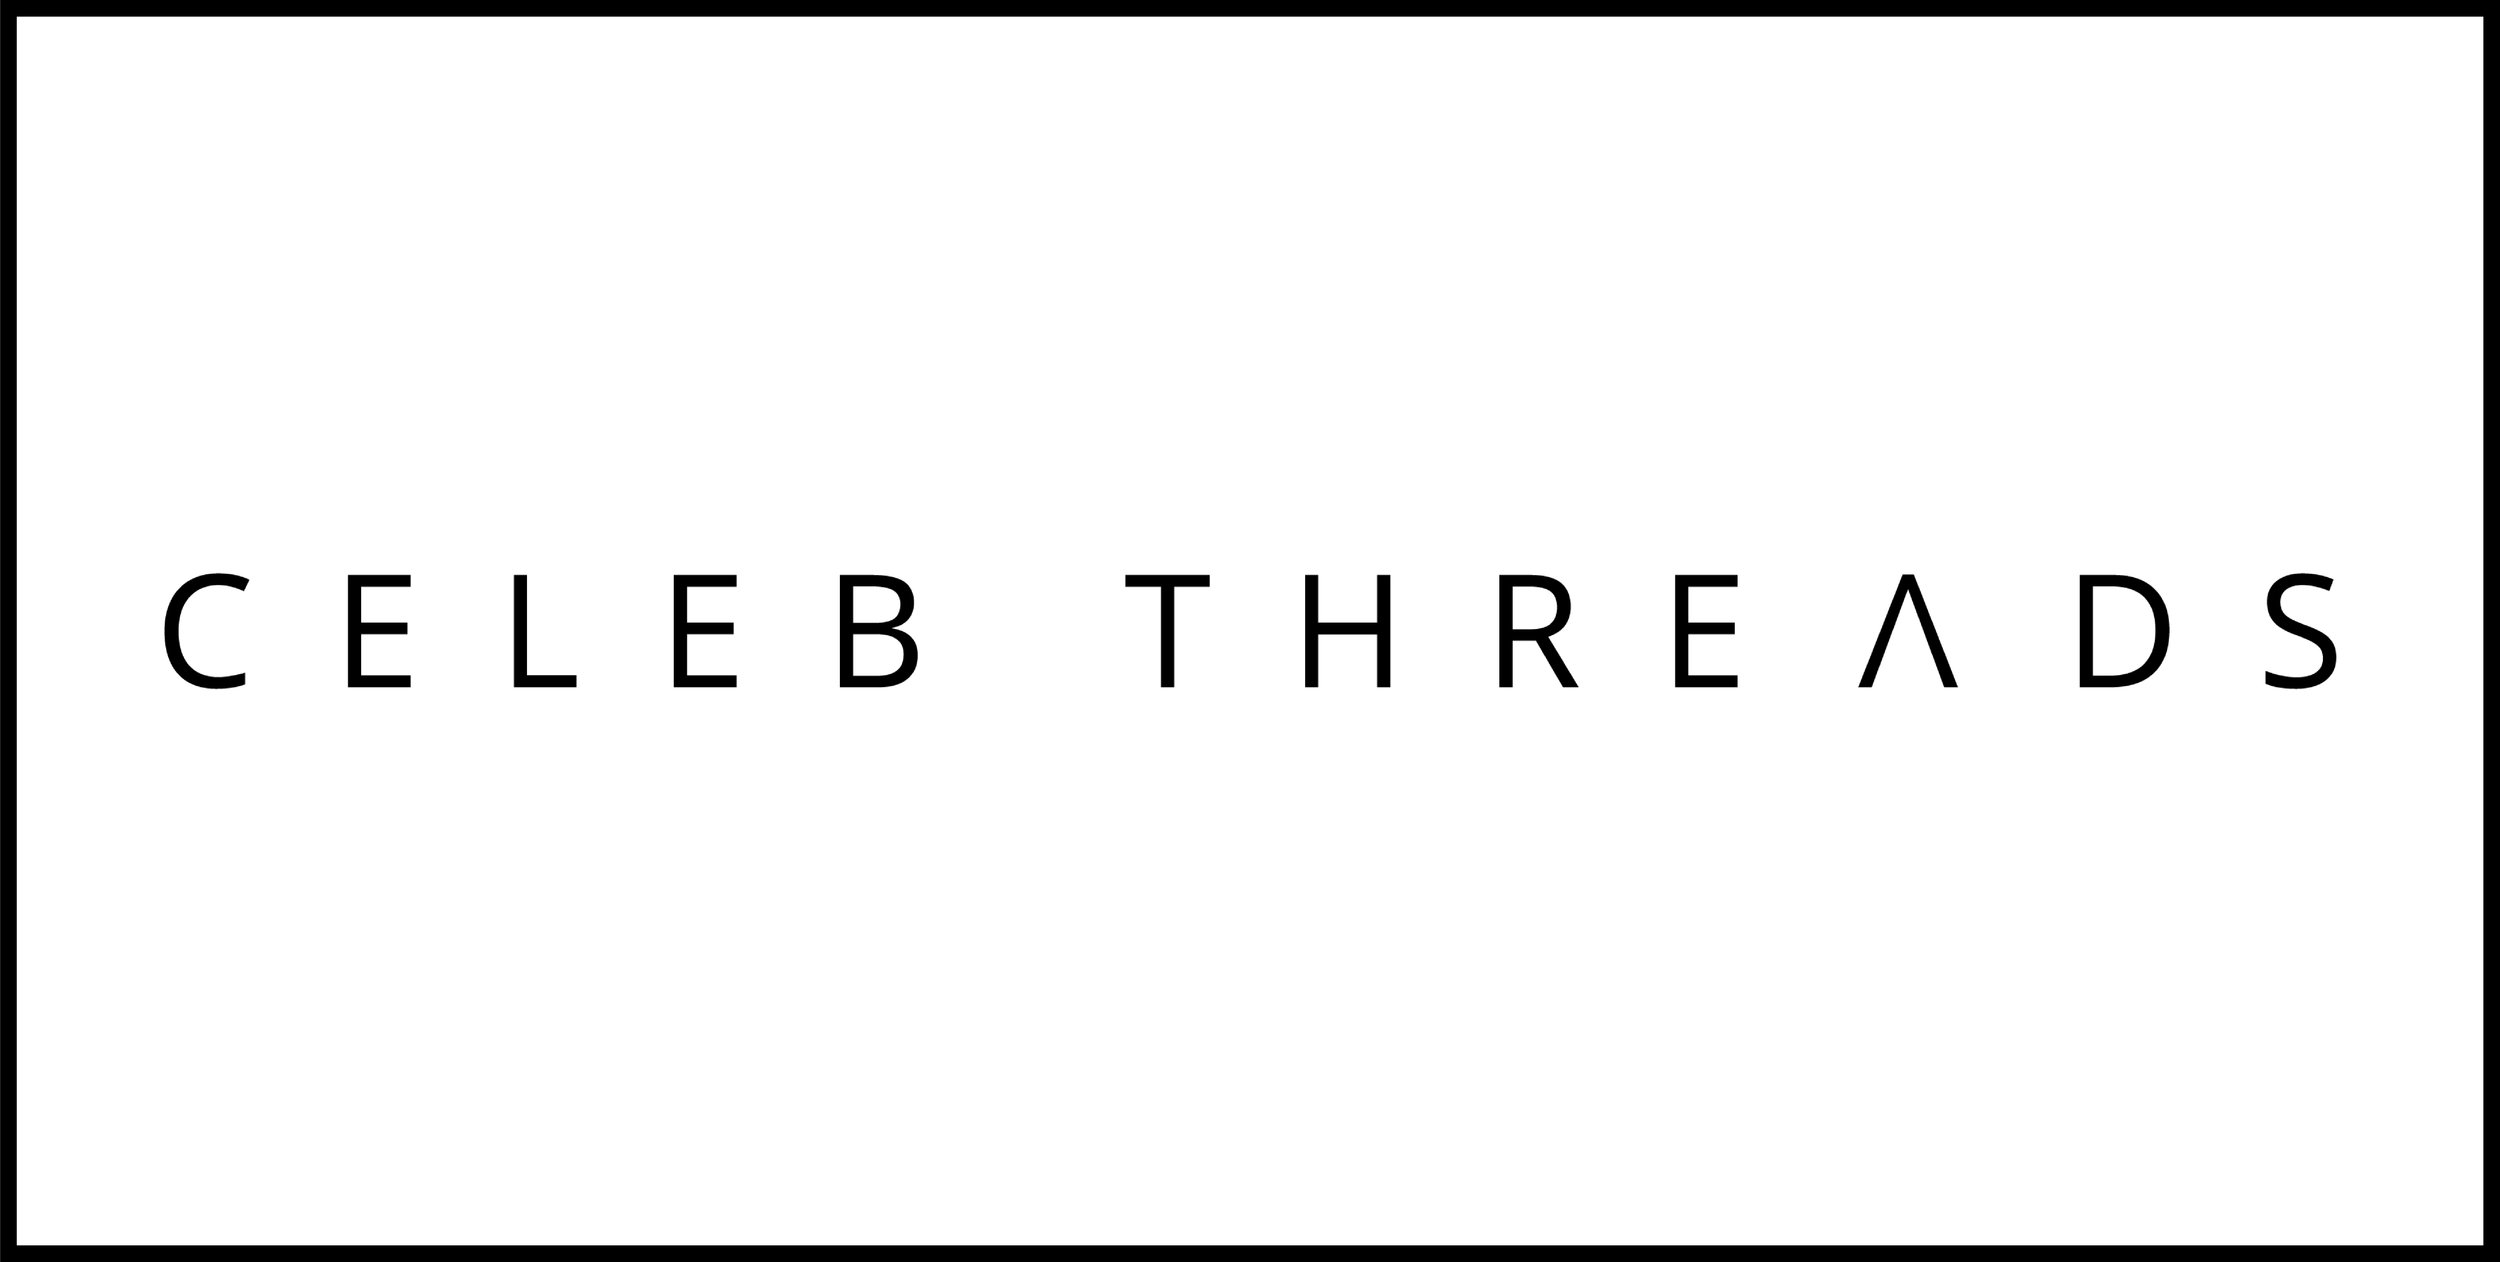 CELEB THREADS